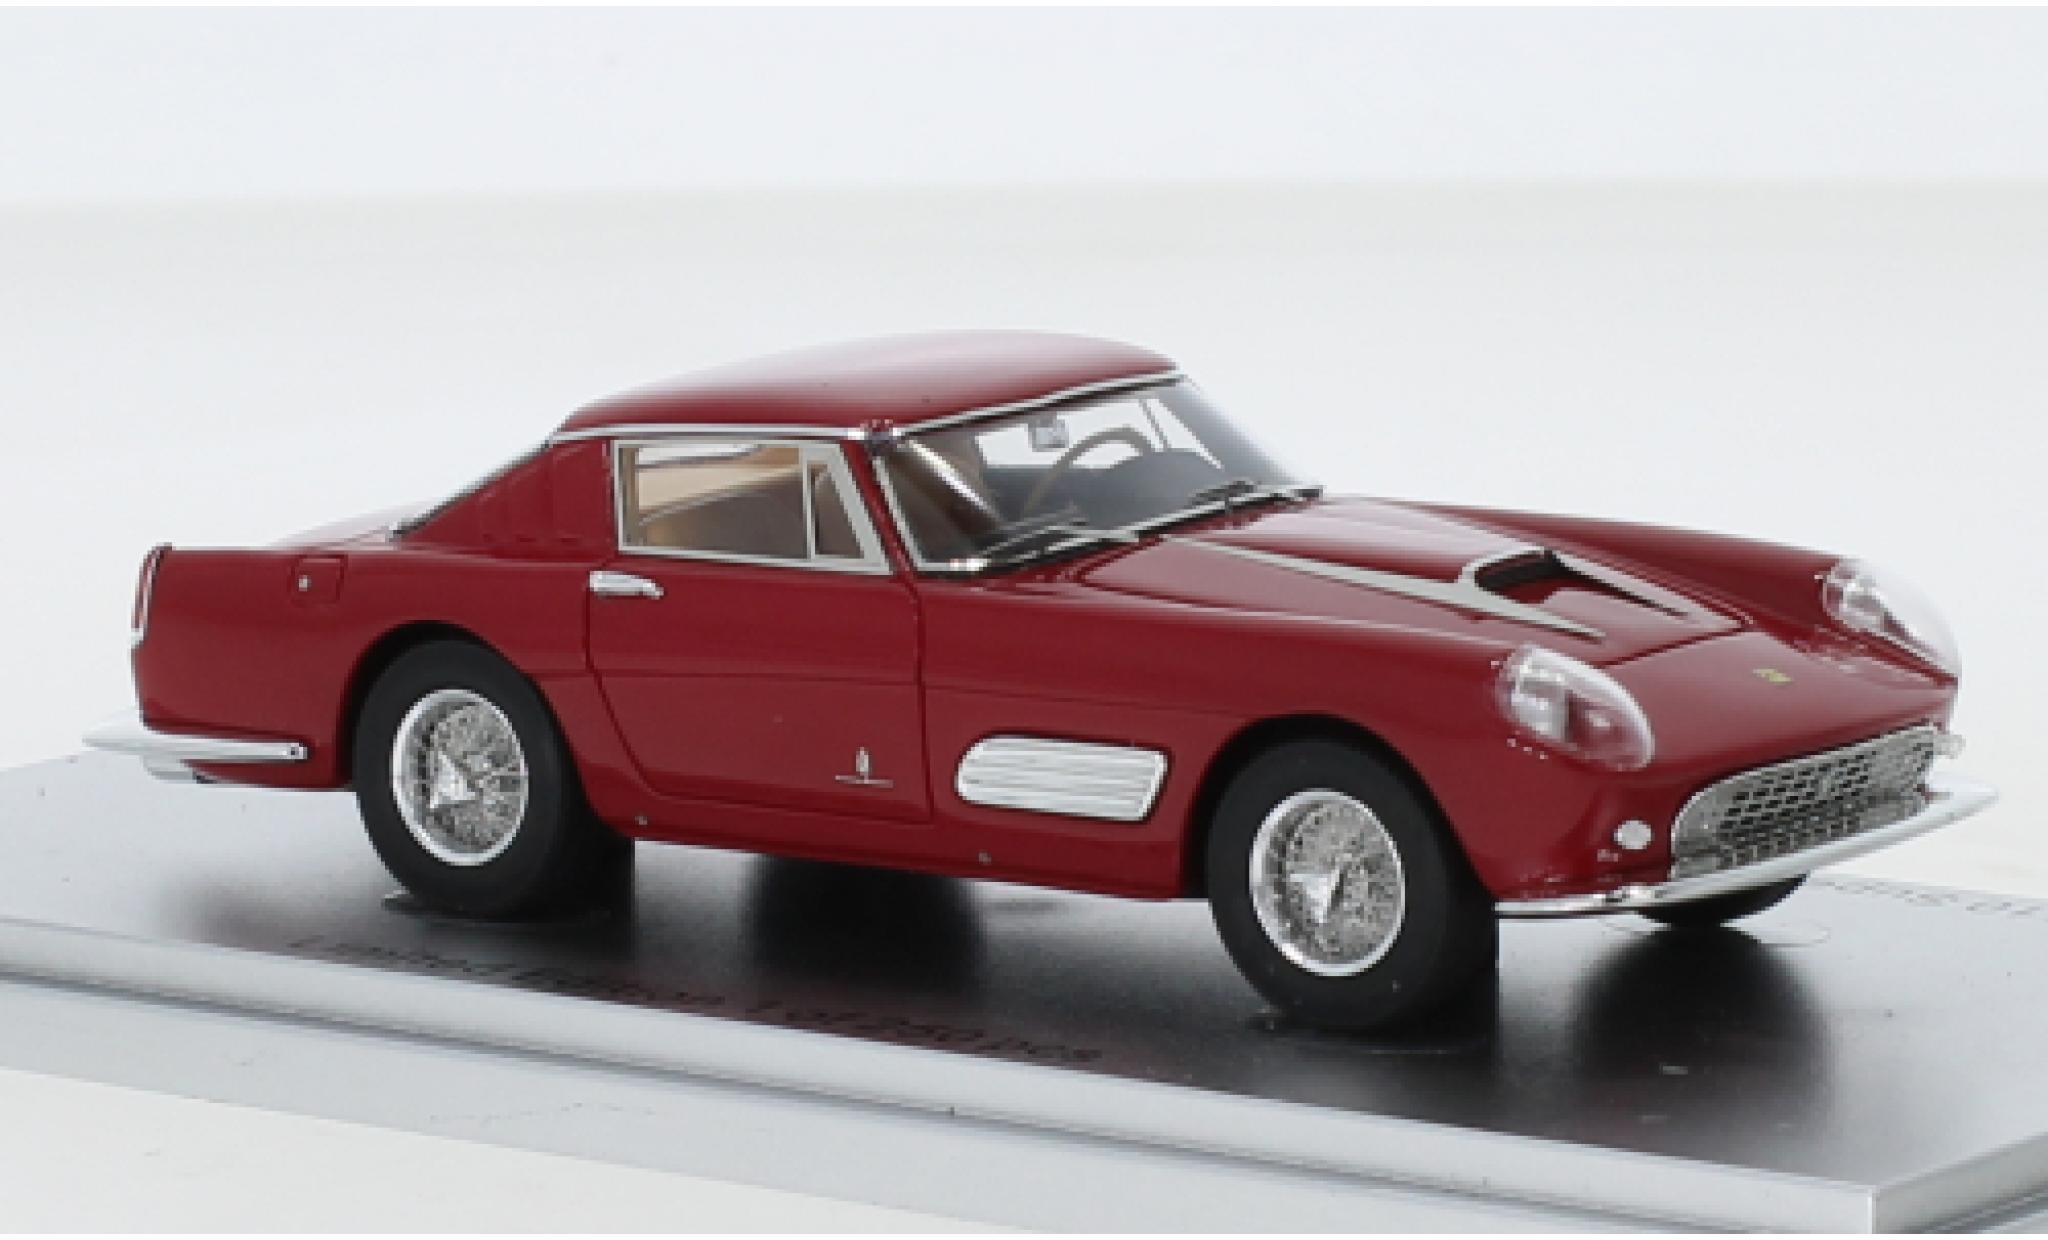 Ferrari 410 1/43 Kess Superamerica Series III Pininfarina Coupe red 1958